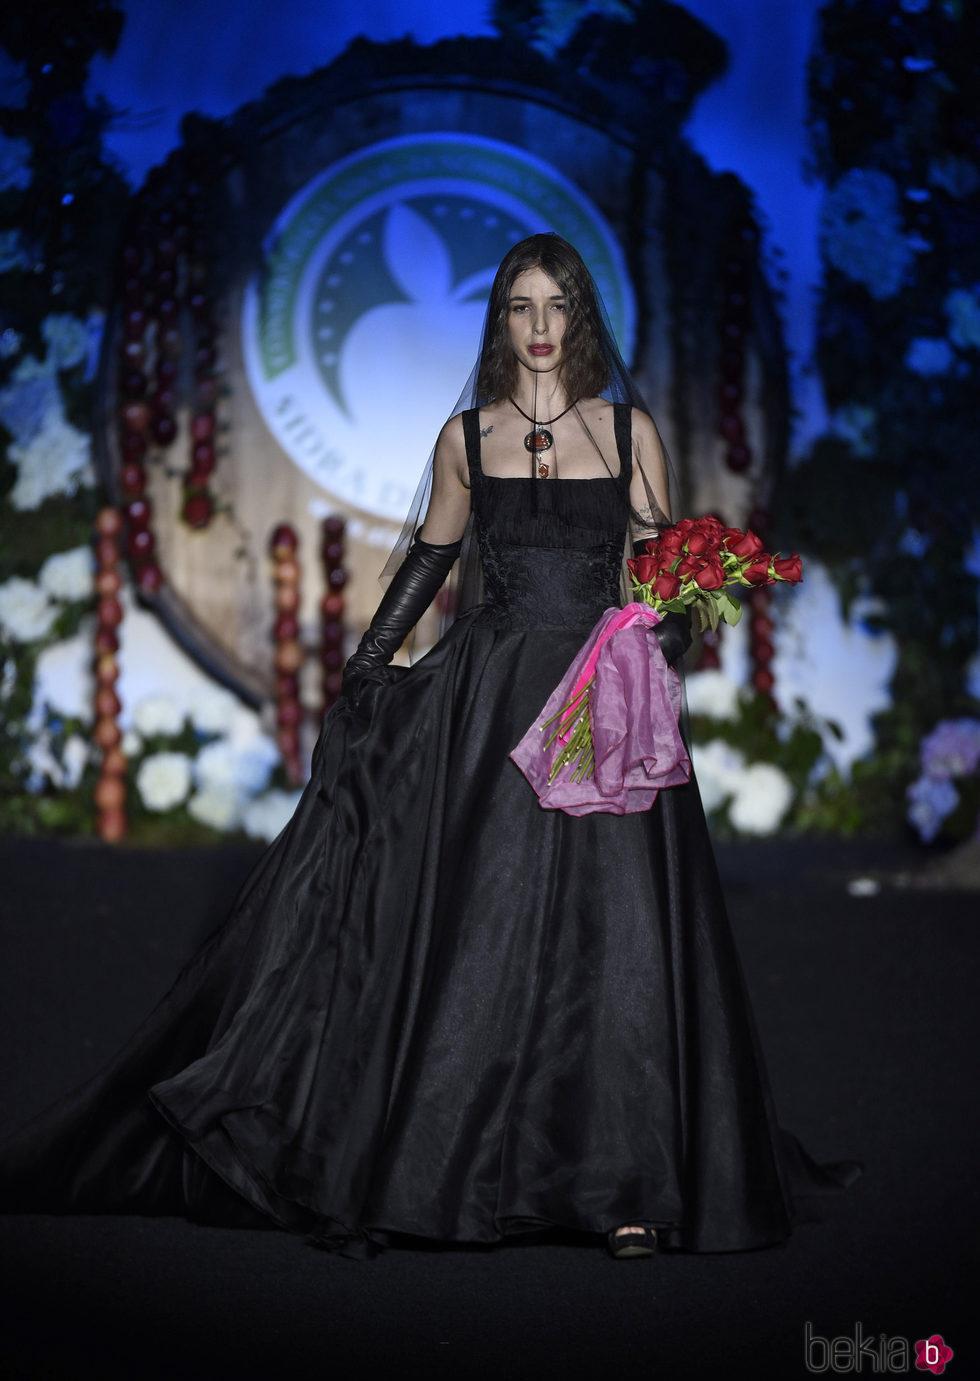 Vestido de novia coleccion otono